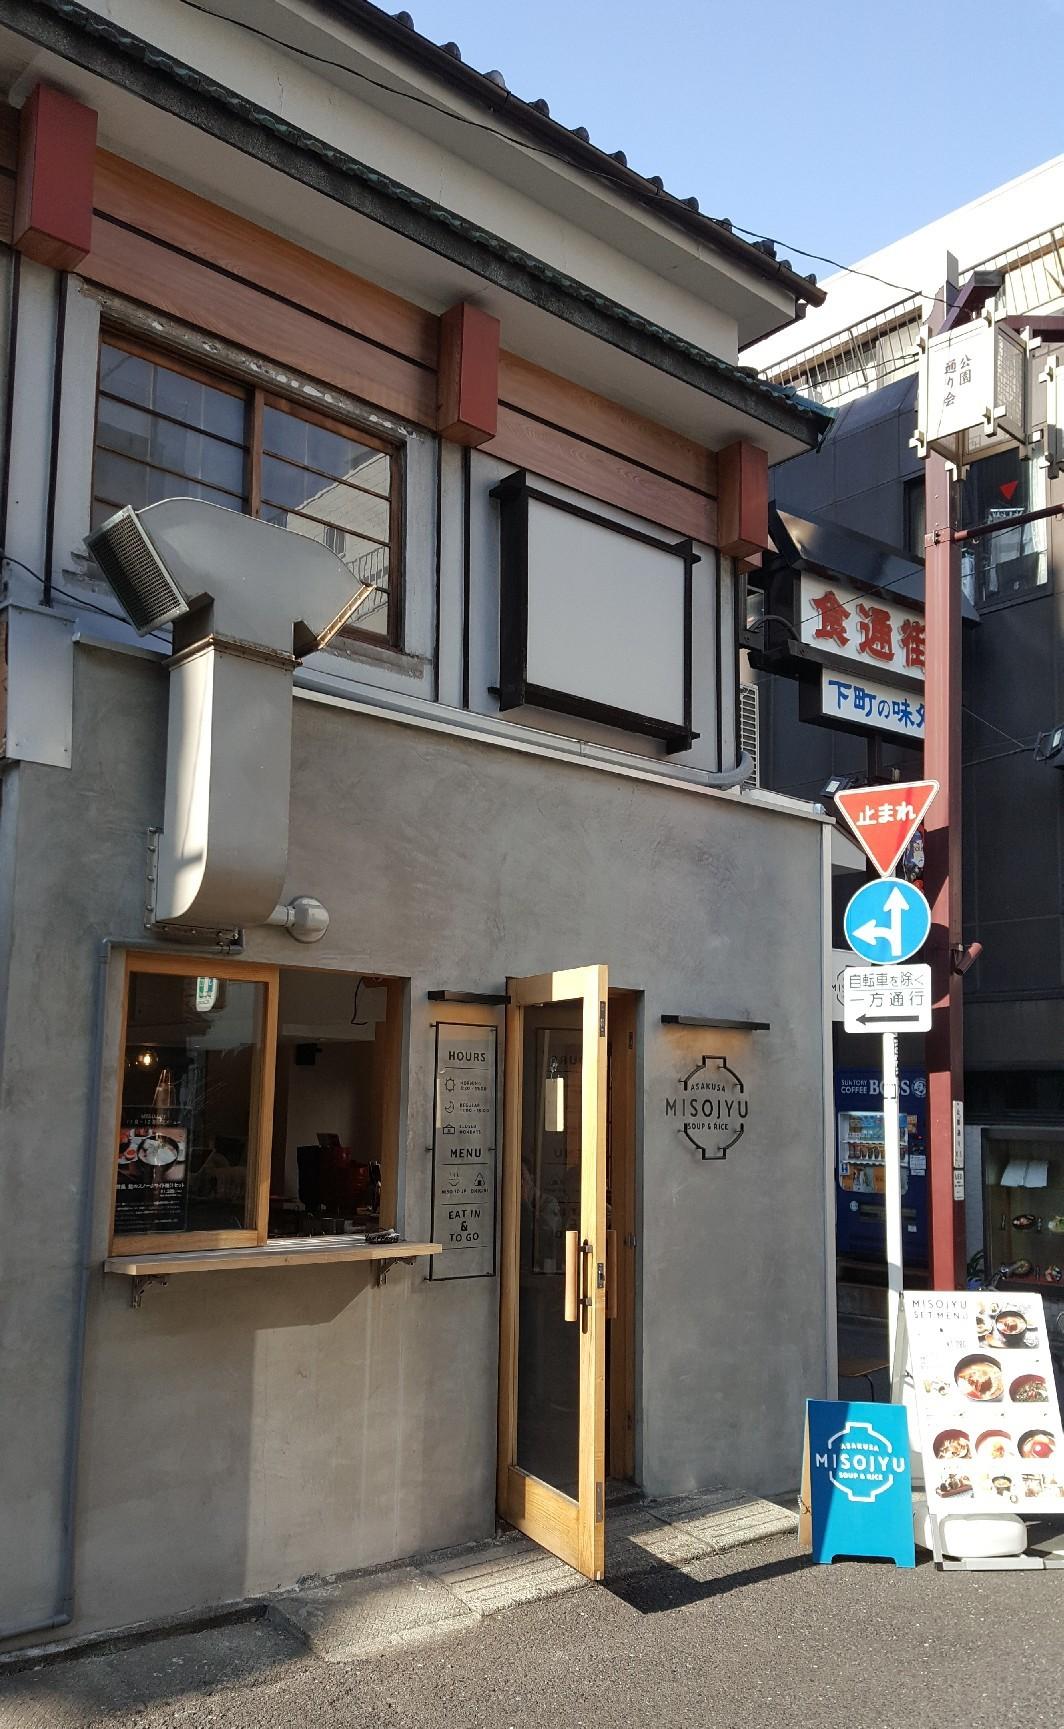 浅草 お味噌汁専門店「MISOJYU」_a0187658_19191383.jpg